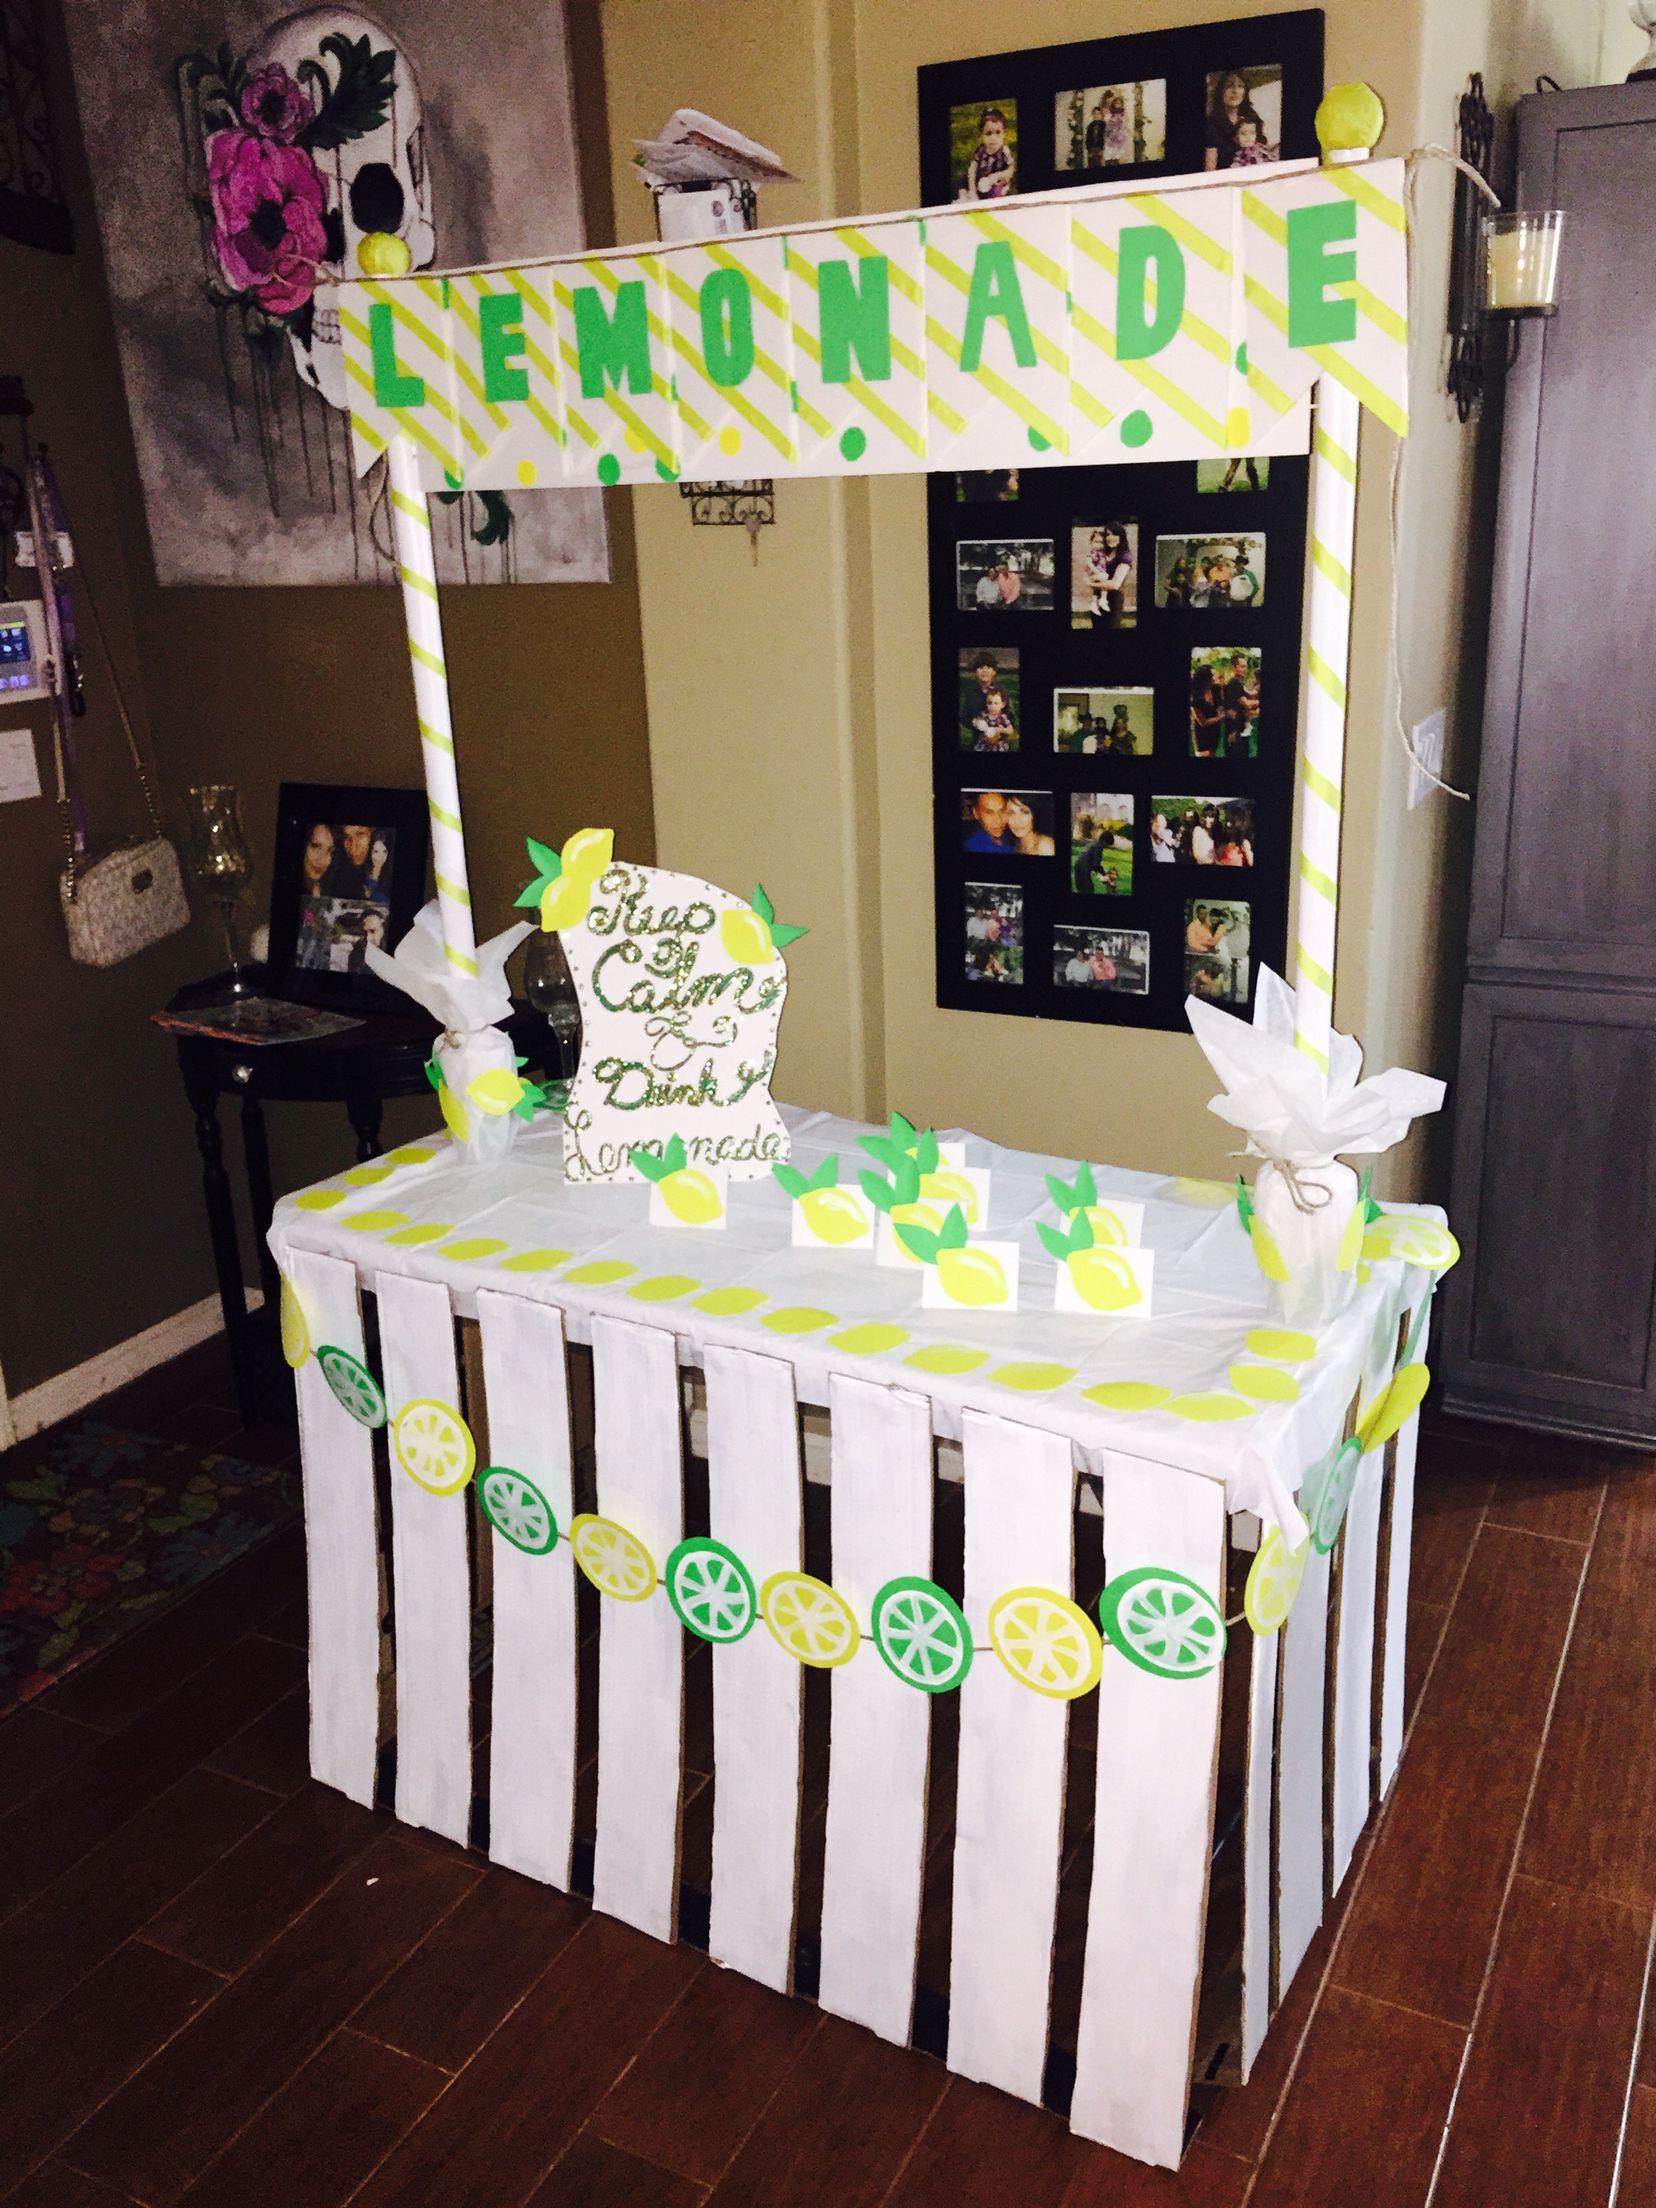 DIY lemonade stand from cardboard!!!!! Diy lemonade